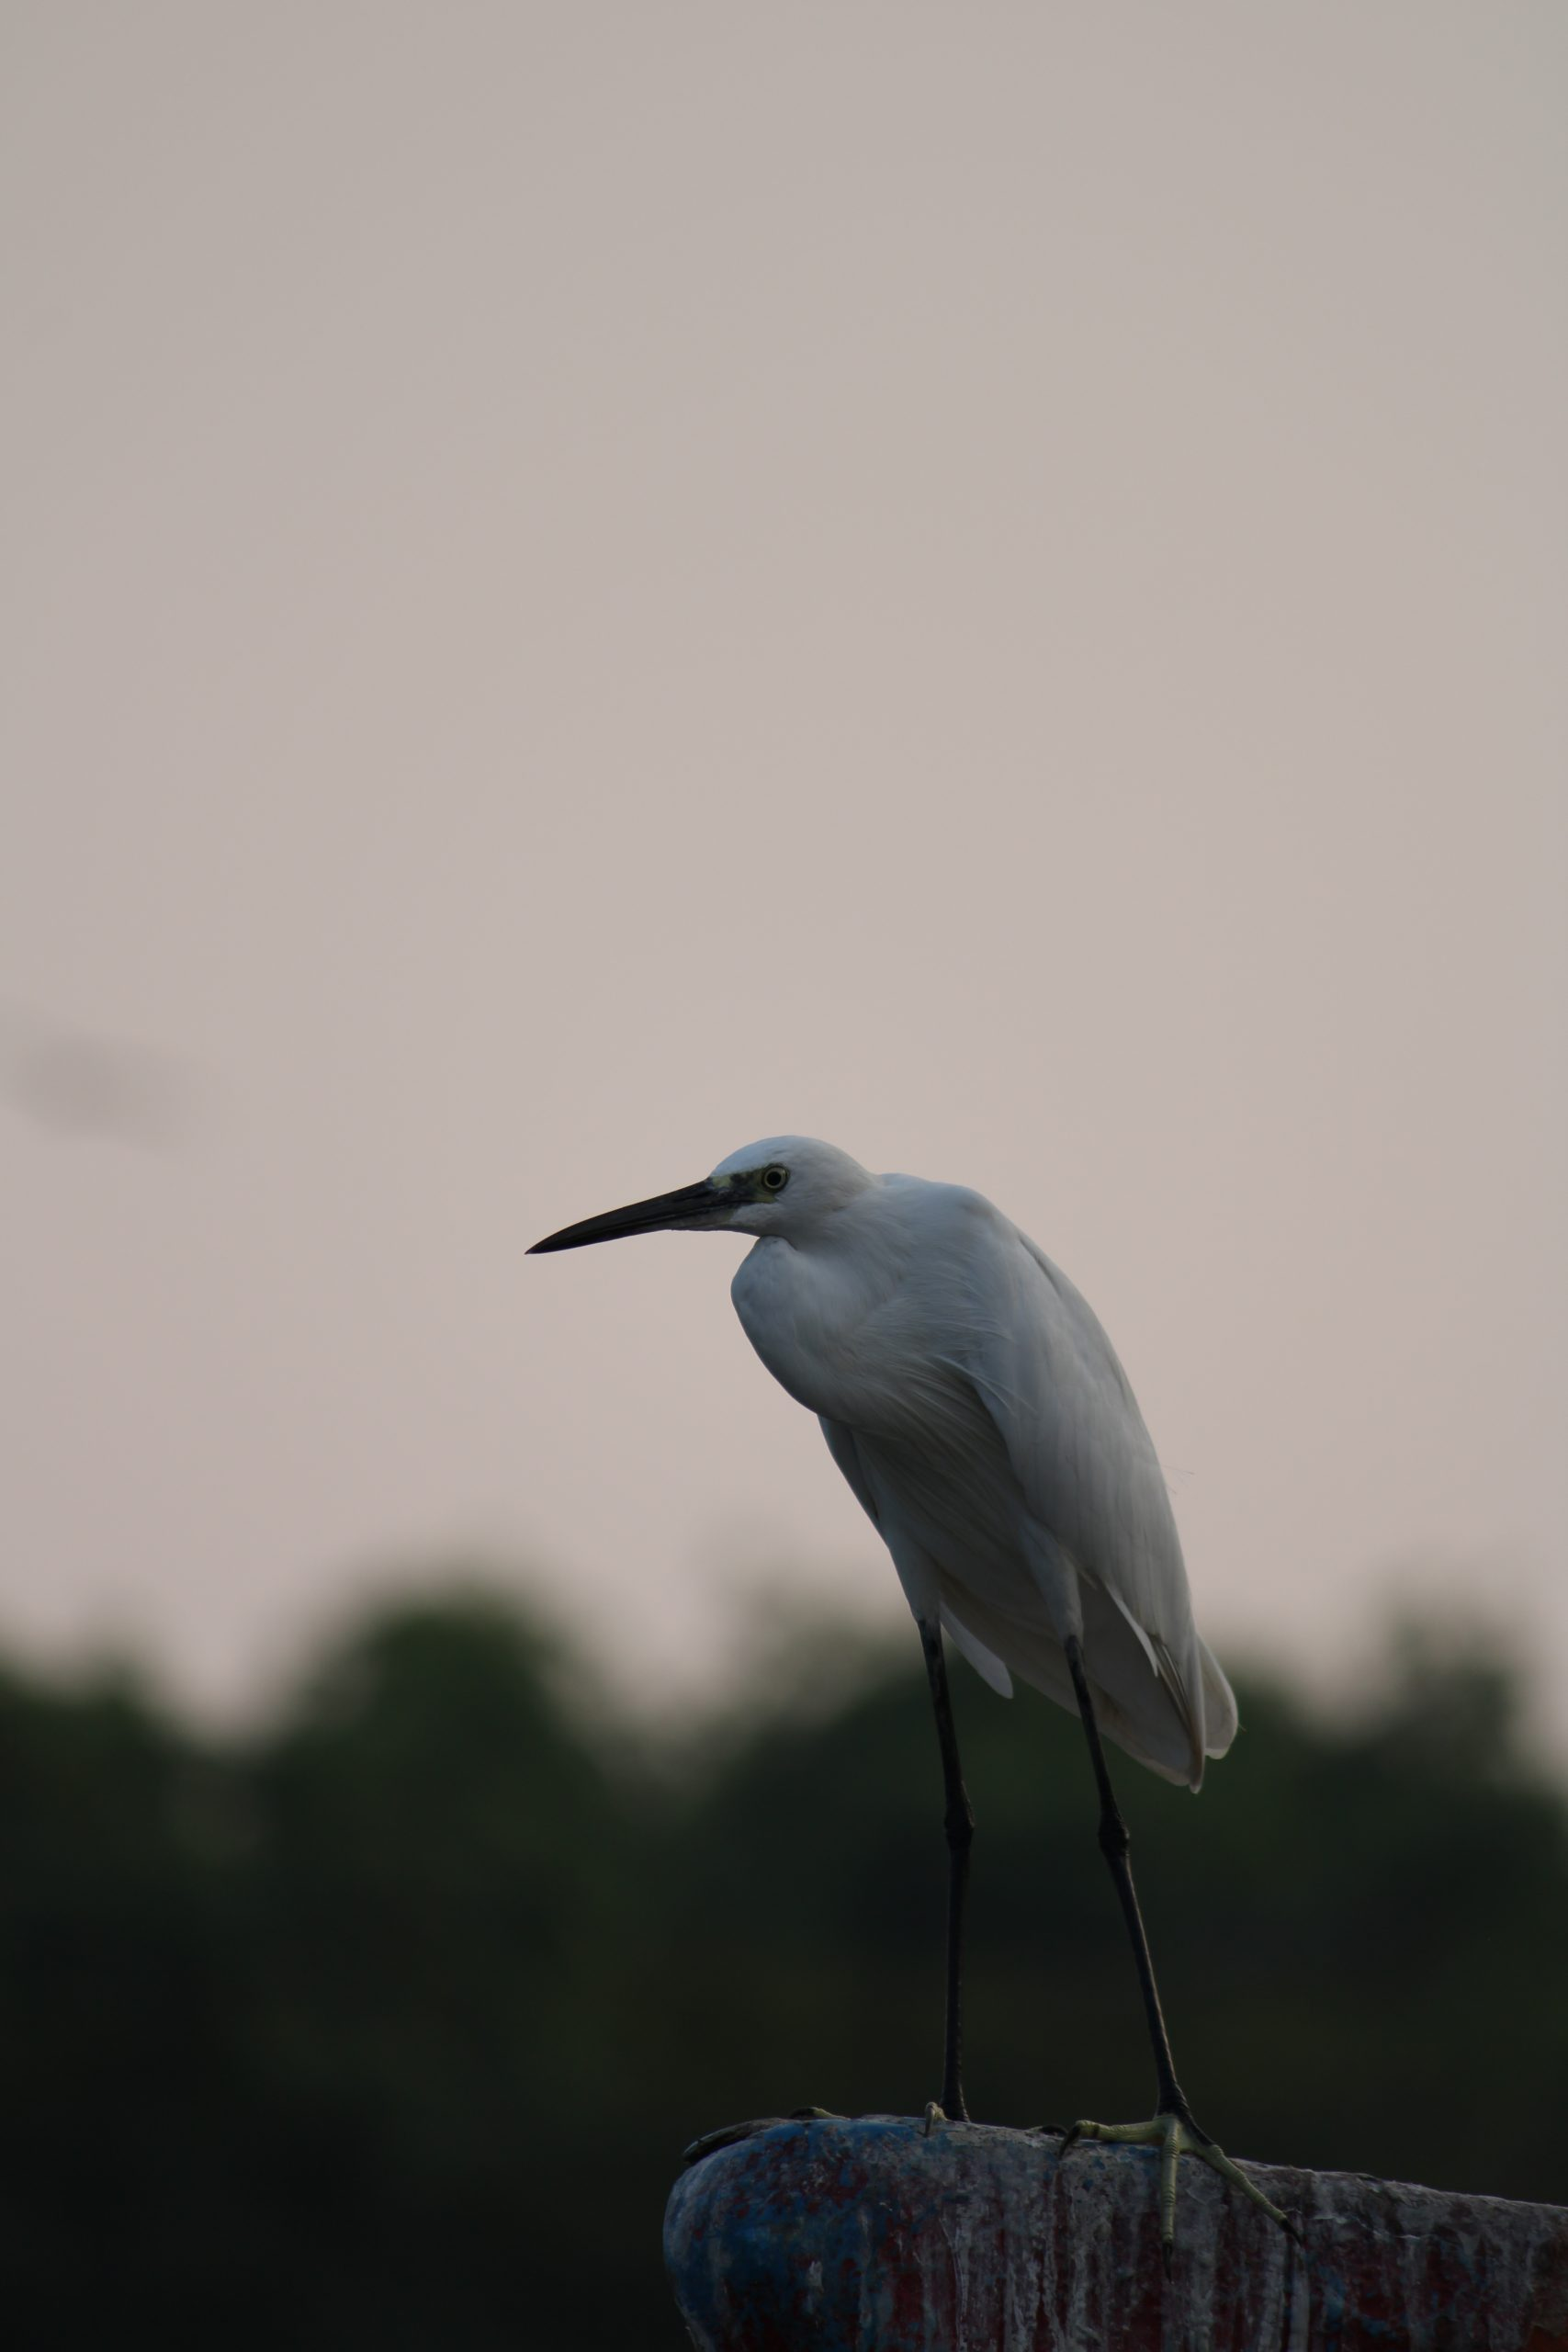 A crane bird sitting